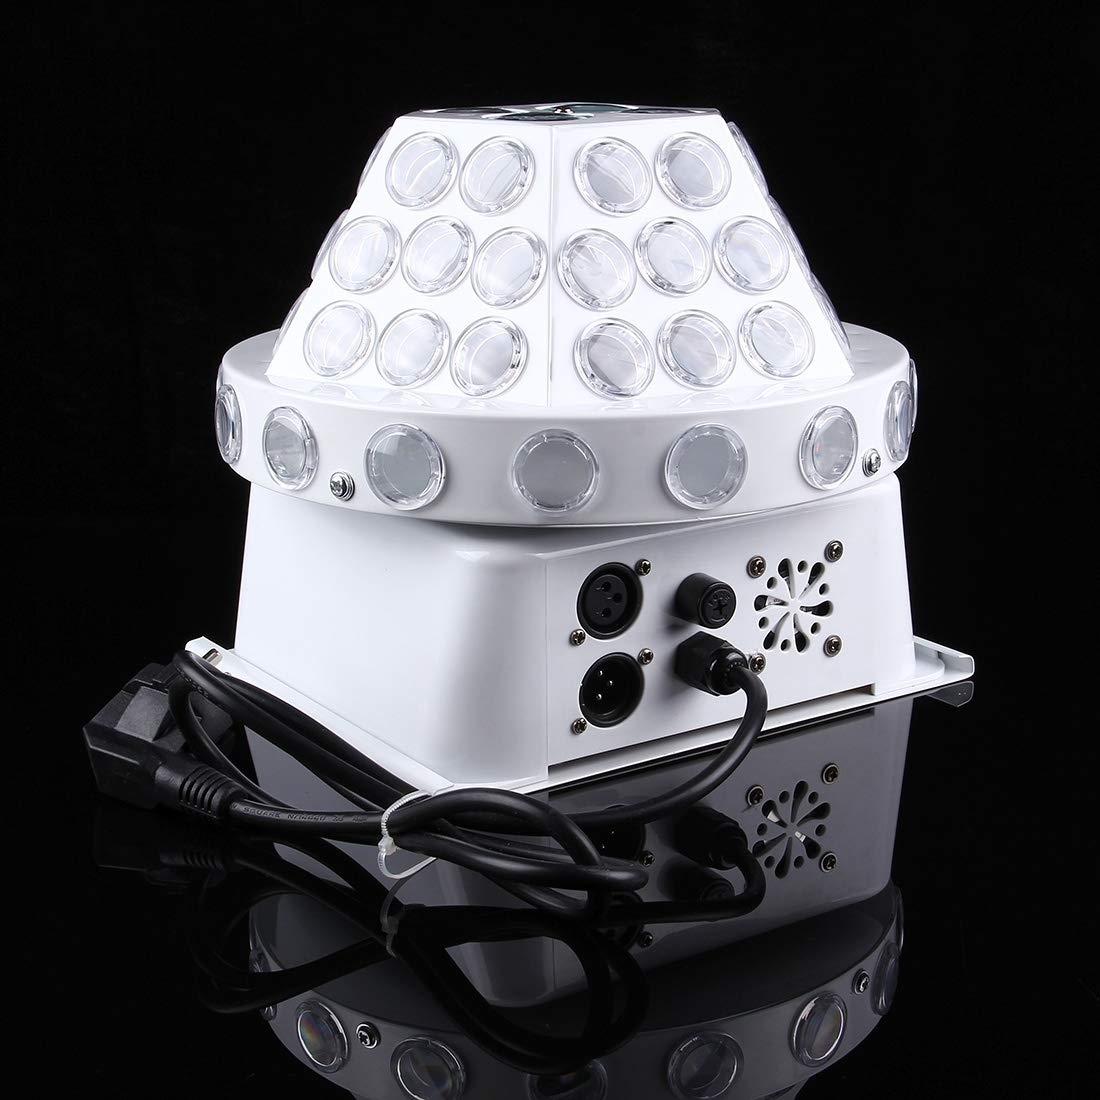 stage lighting 30W Mushroom Magic Ball LED Crystal Light, Master/Slave / DMX512 / Auto Run/Sound Control Modes, AC 220V by stage lighting (Image #4)